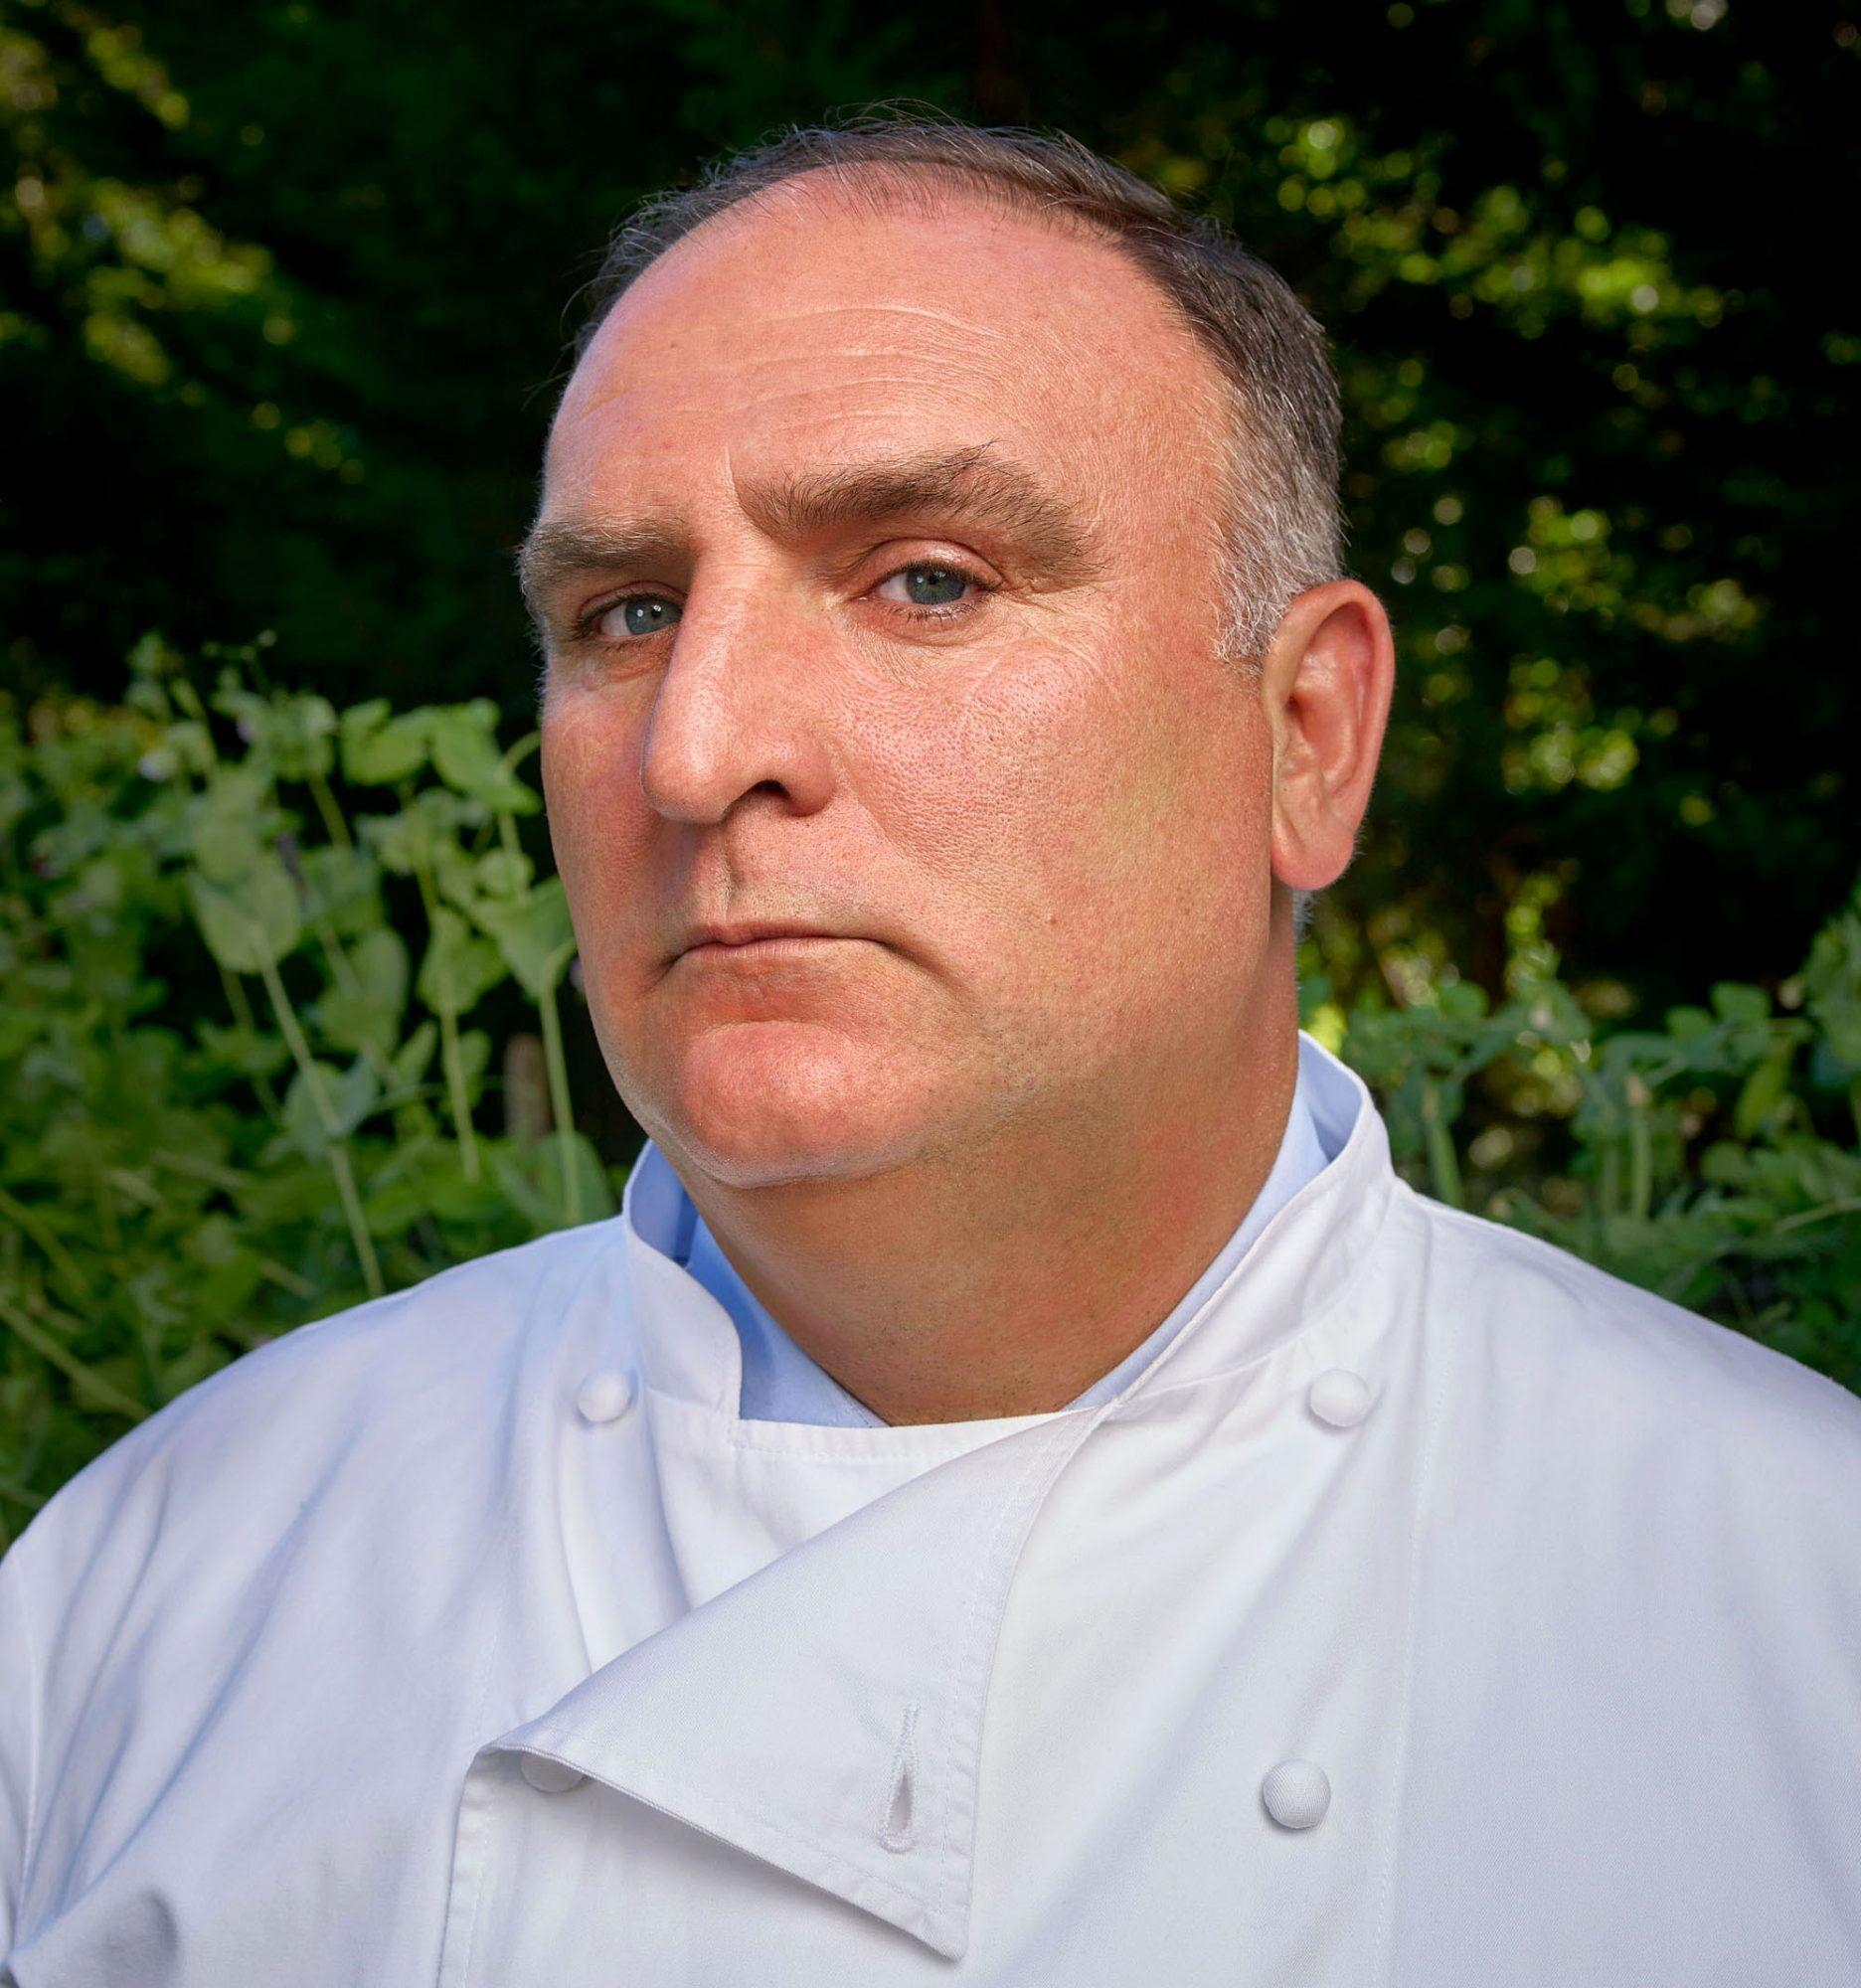 portrait of celebrity chef jose andres